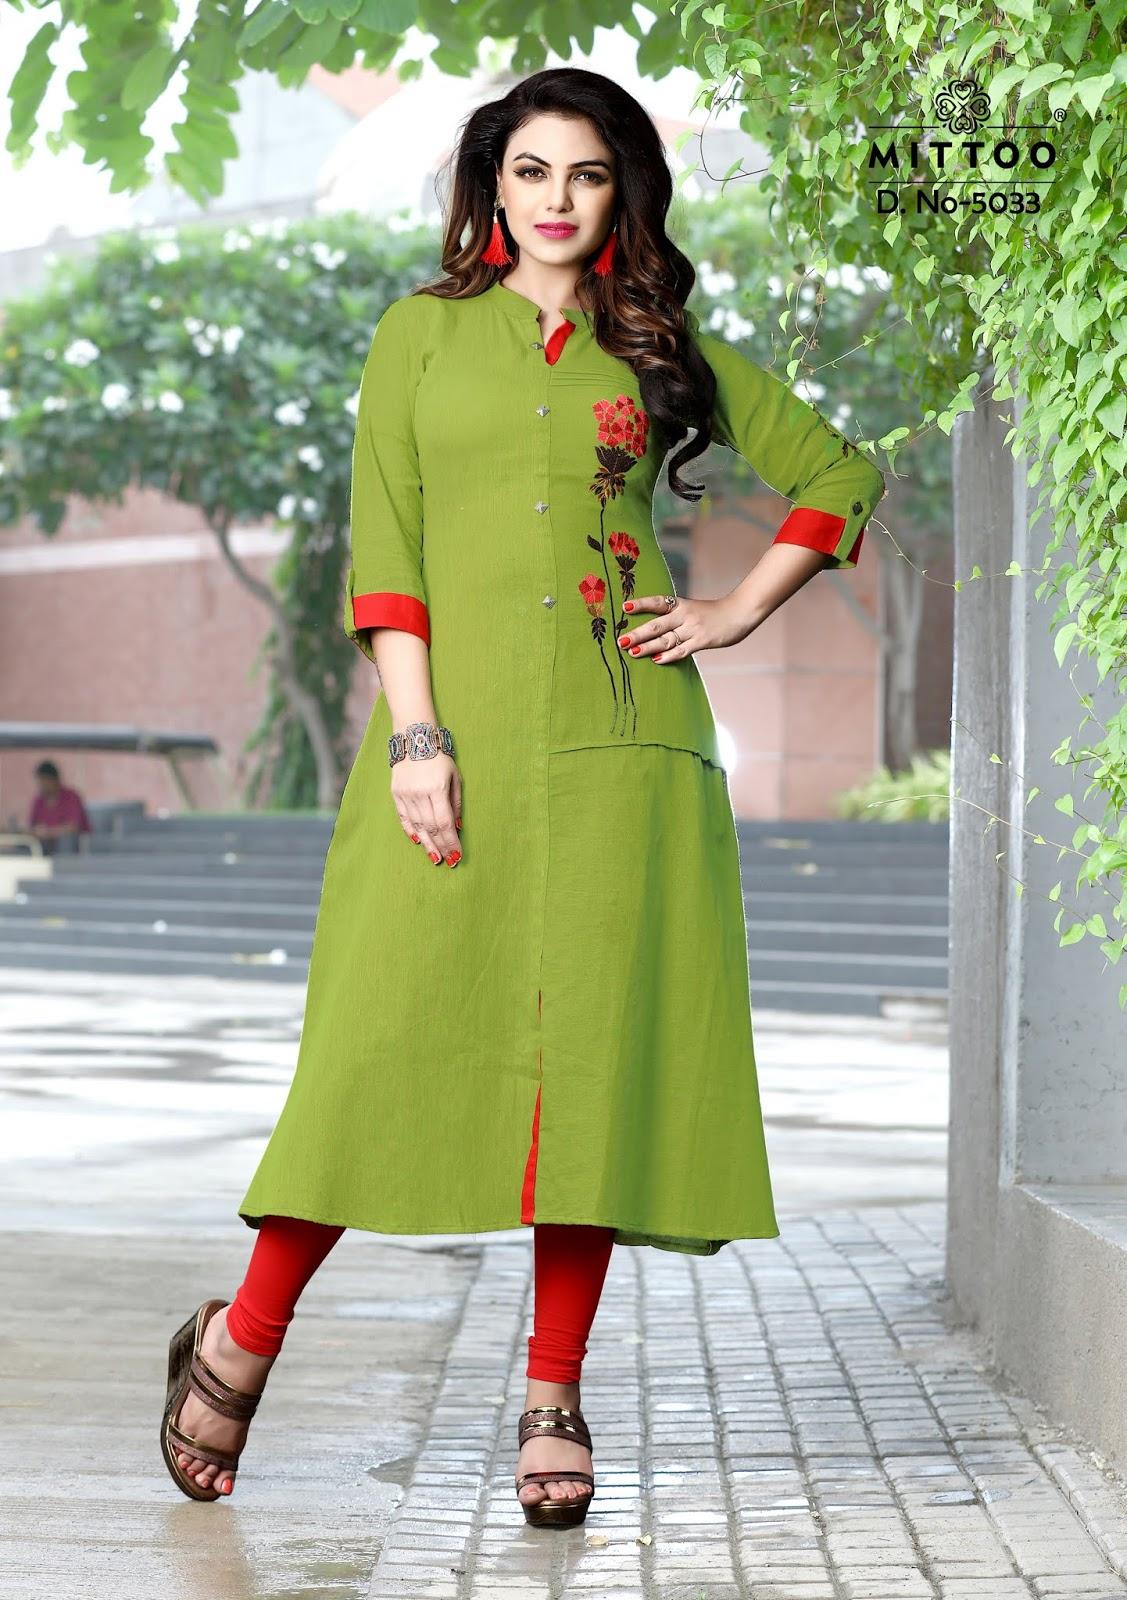 efe9a238ad Brand Name : MITTOO Catalog : Kanisha Design : 7. Fabric : Rayon Namho Slub  Work : Thread Embroidery Size : M(38), L(40), XL(42), XXL(44), XXXL(46)